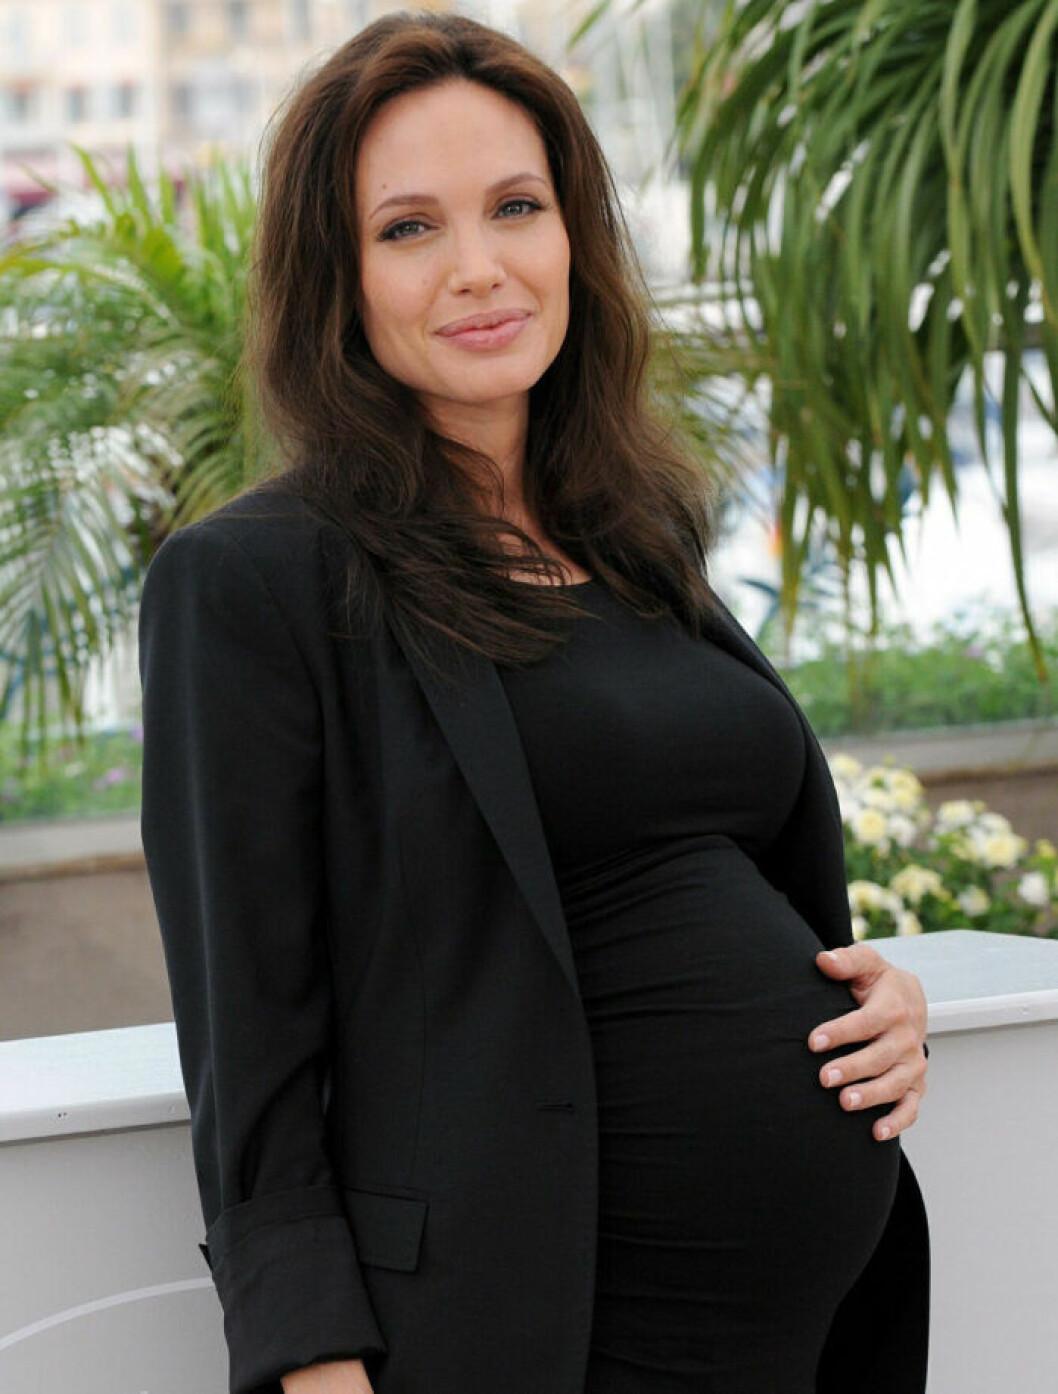 angelina jolie gravid